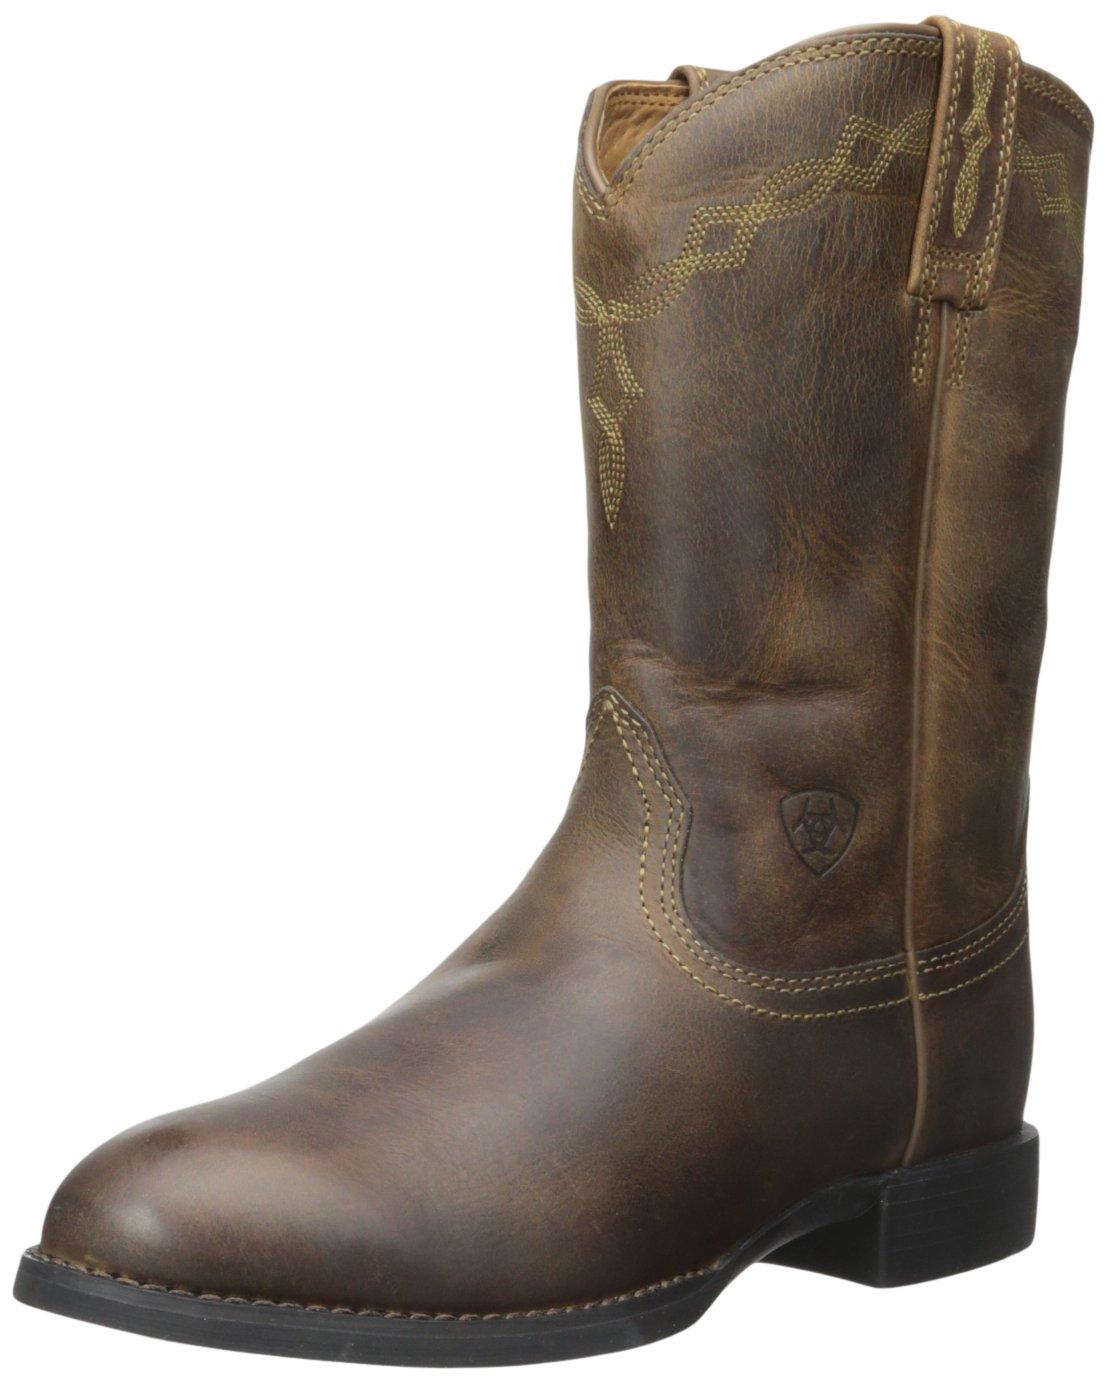 Ariat Women's Heritage Roper Western Cowboy Boot B000A6ZW2K 11 B(M) US|Distressed Brown